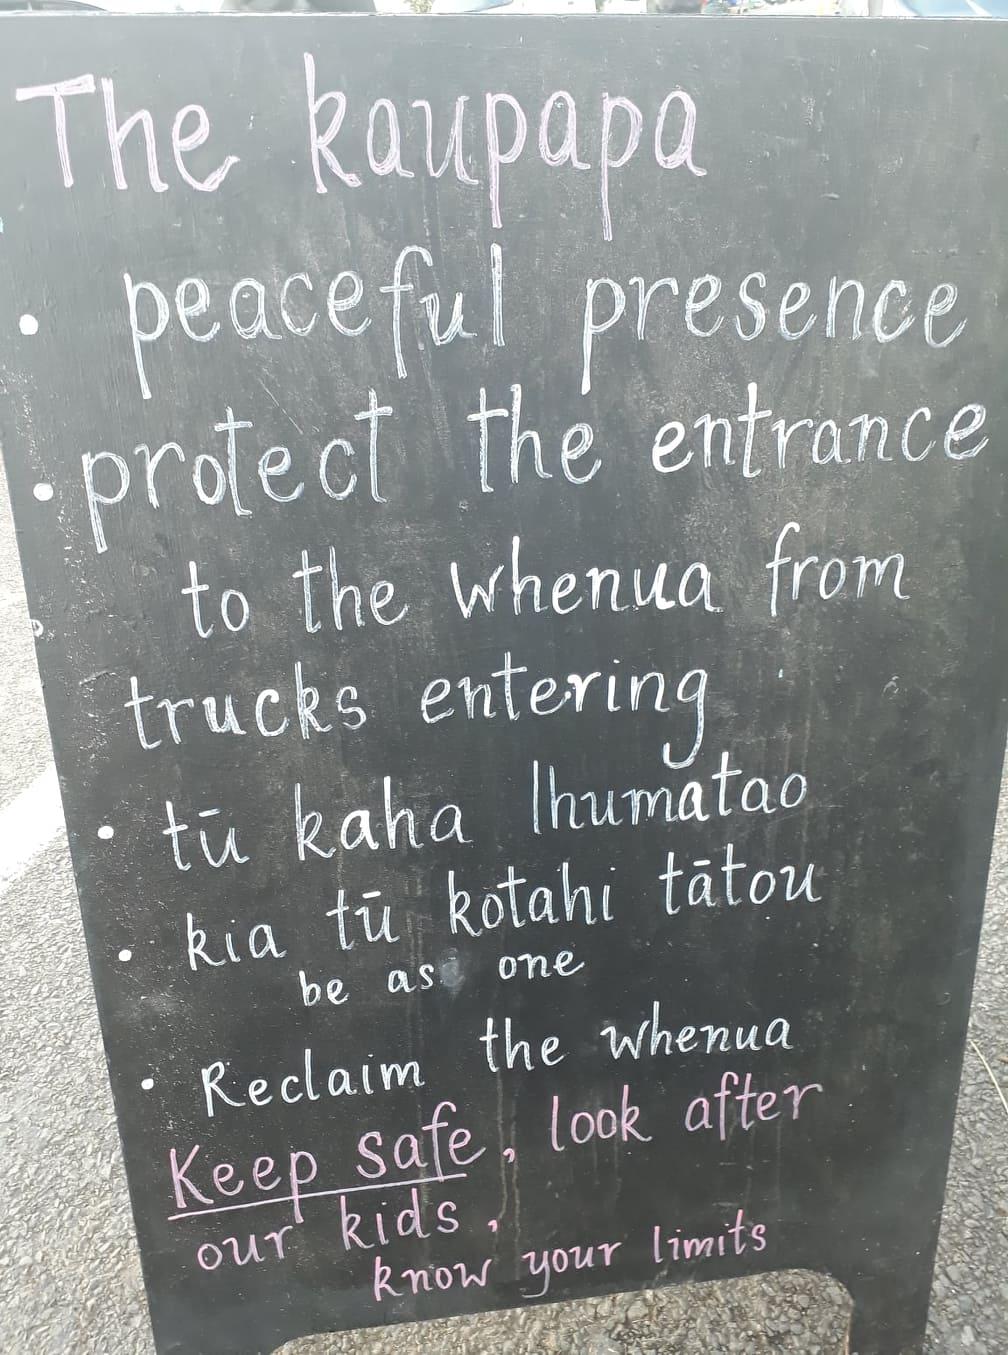 The Kaupapa.